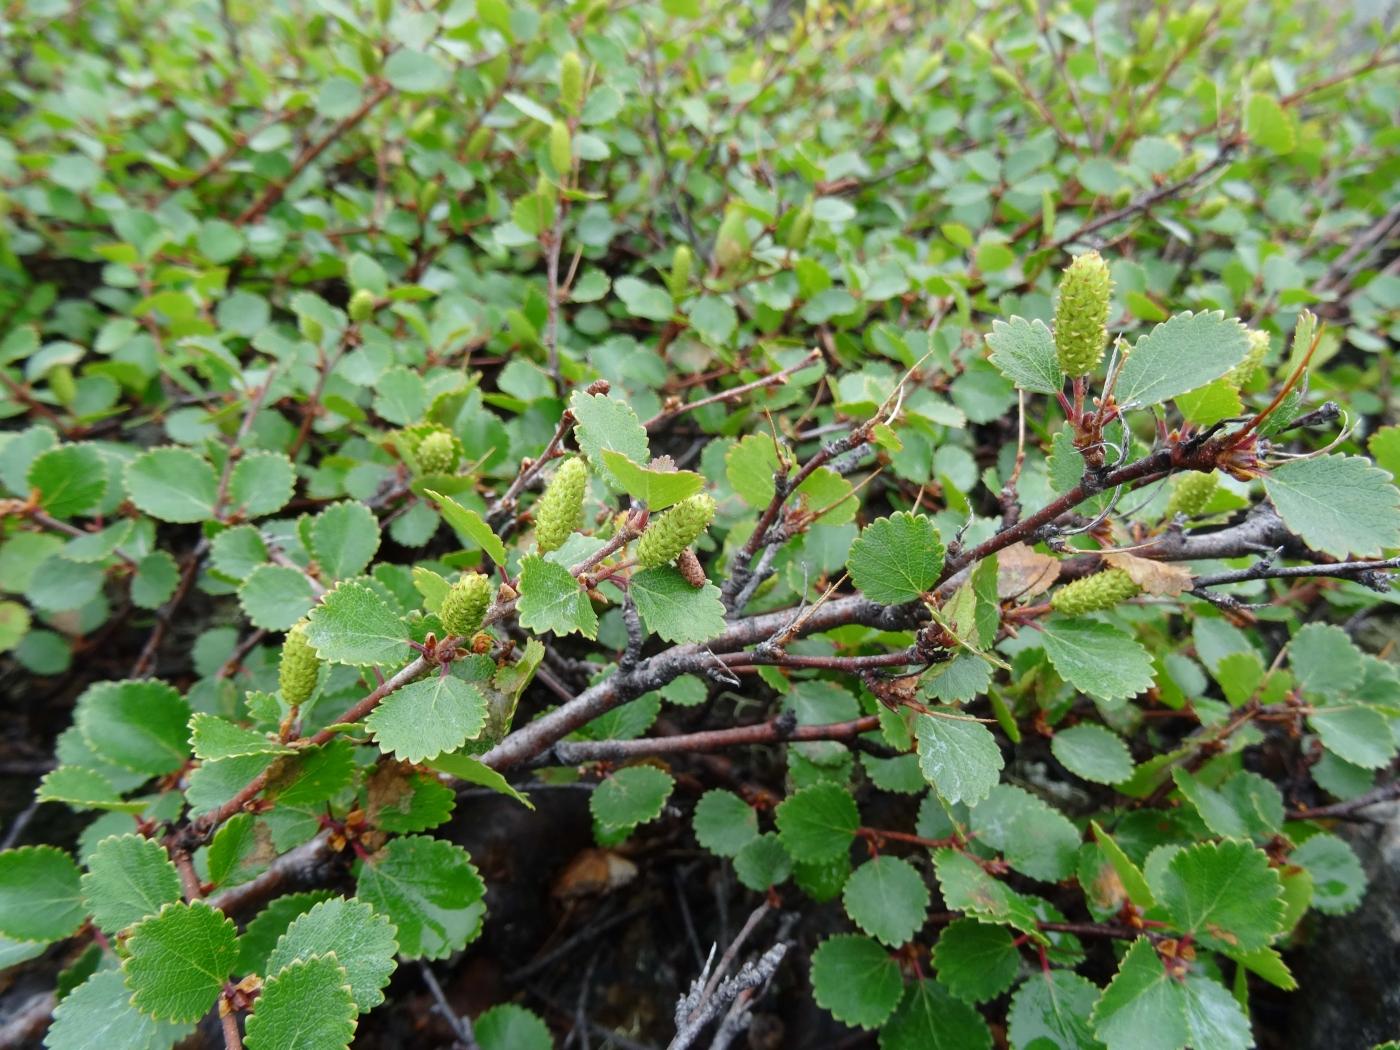 Downy birch - Orpik. Photo by Gitte L. Ottosen.